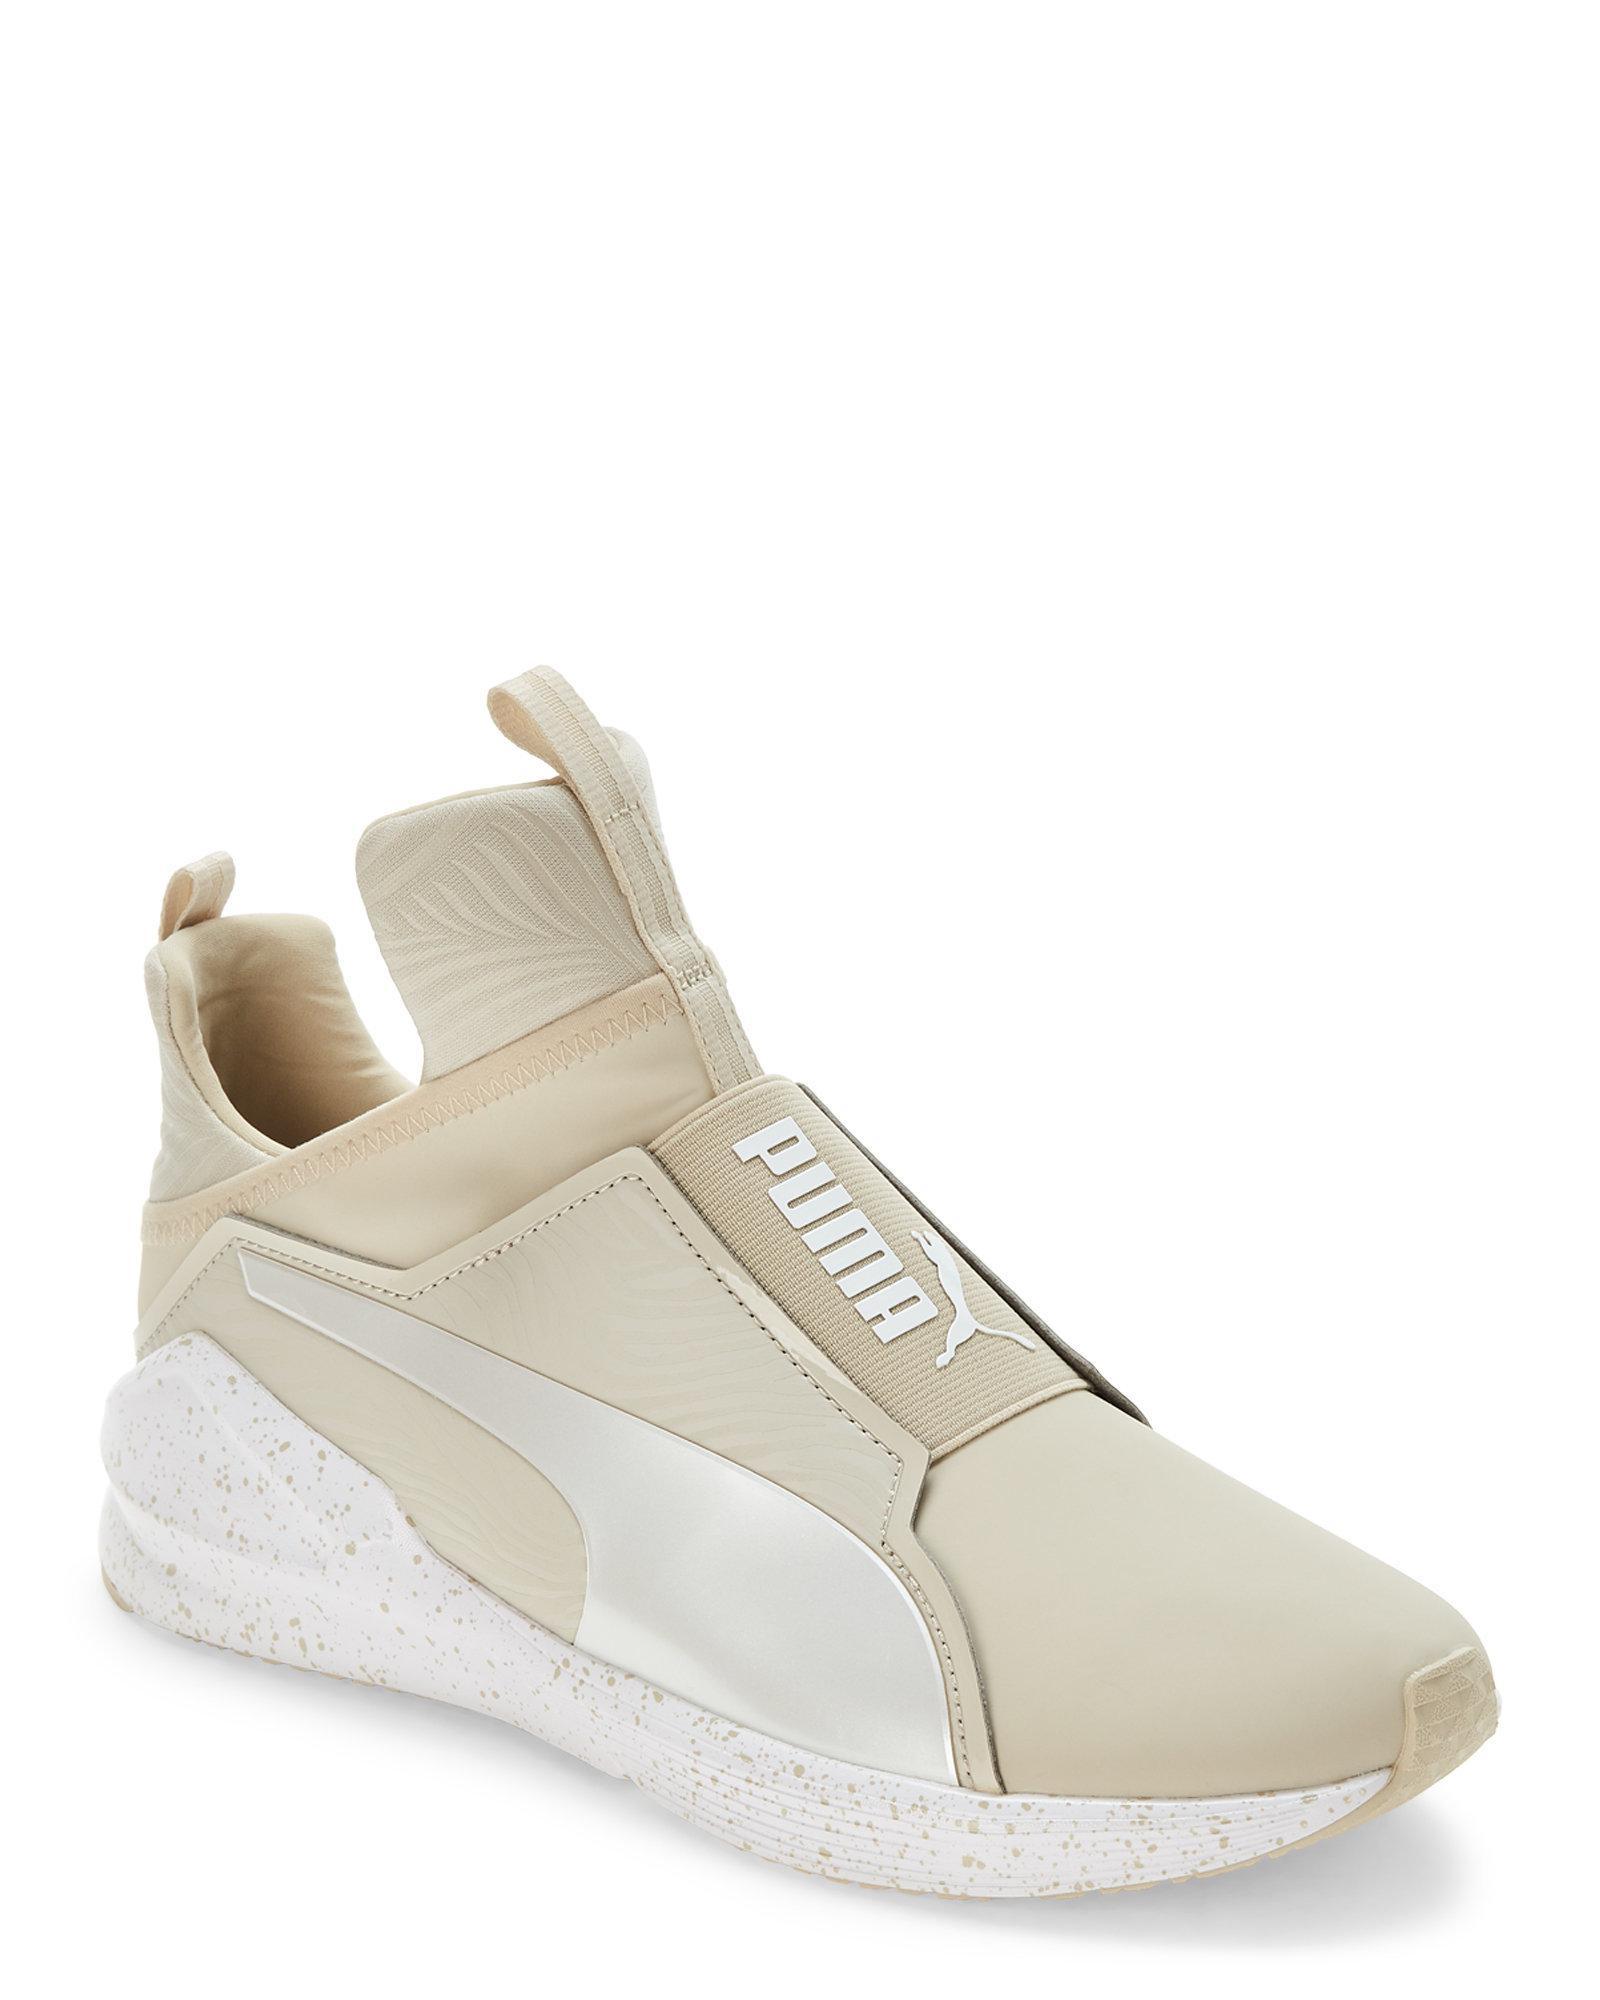 56fbc10fcf38d4 Lyst - PUMA Oatmeal   White Fierce Bleached Training Sneakers in White